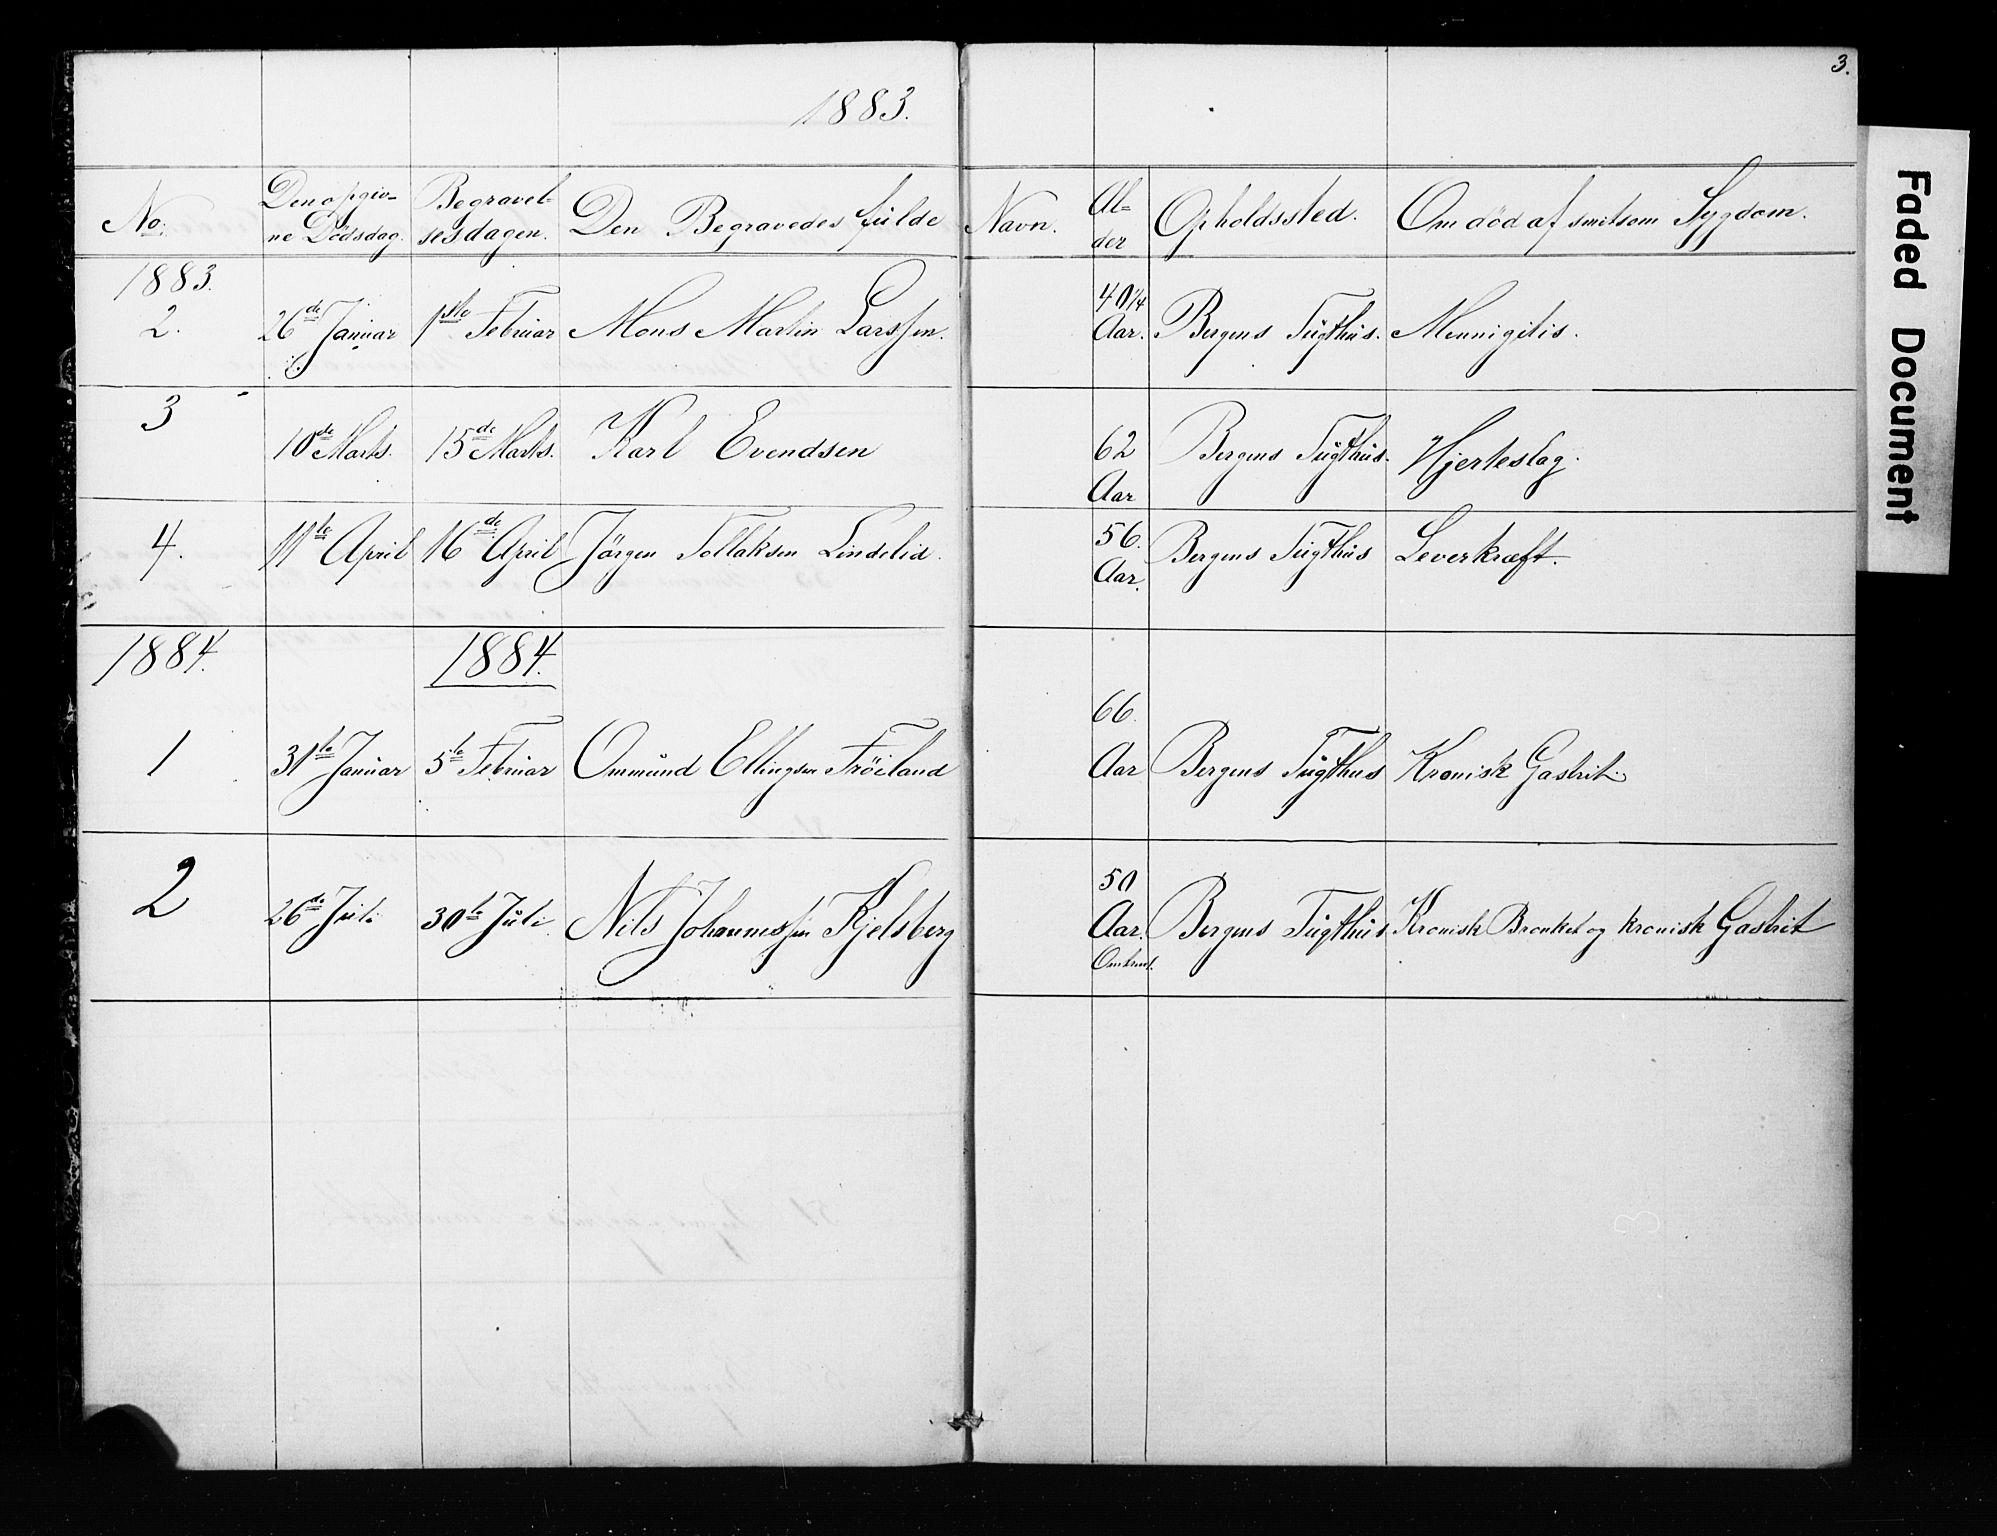 SAB, Bergens strafanstalts sokneprestembete*, Klokkerbok nr. A 1, 1874-1884, s. 3